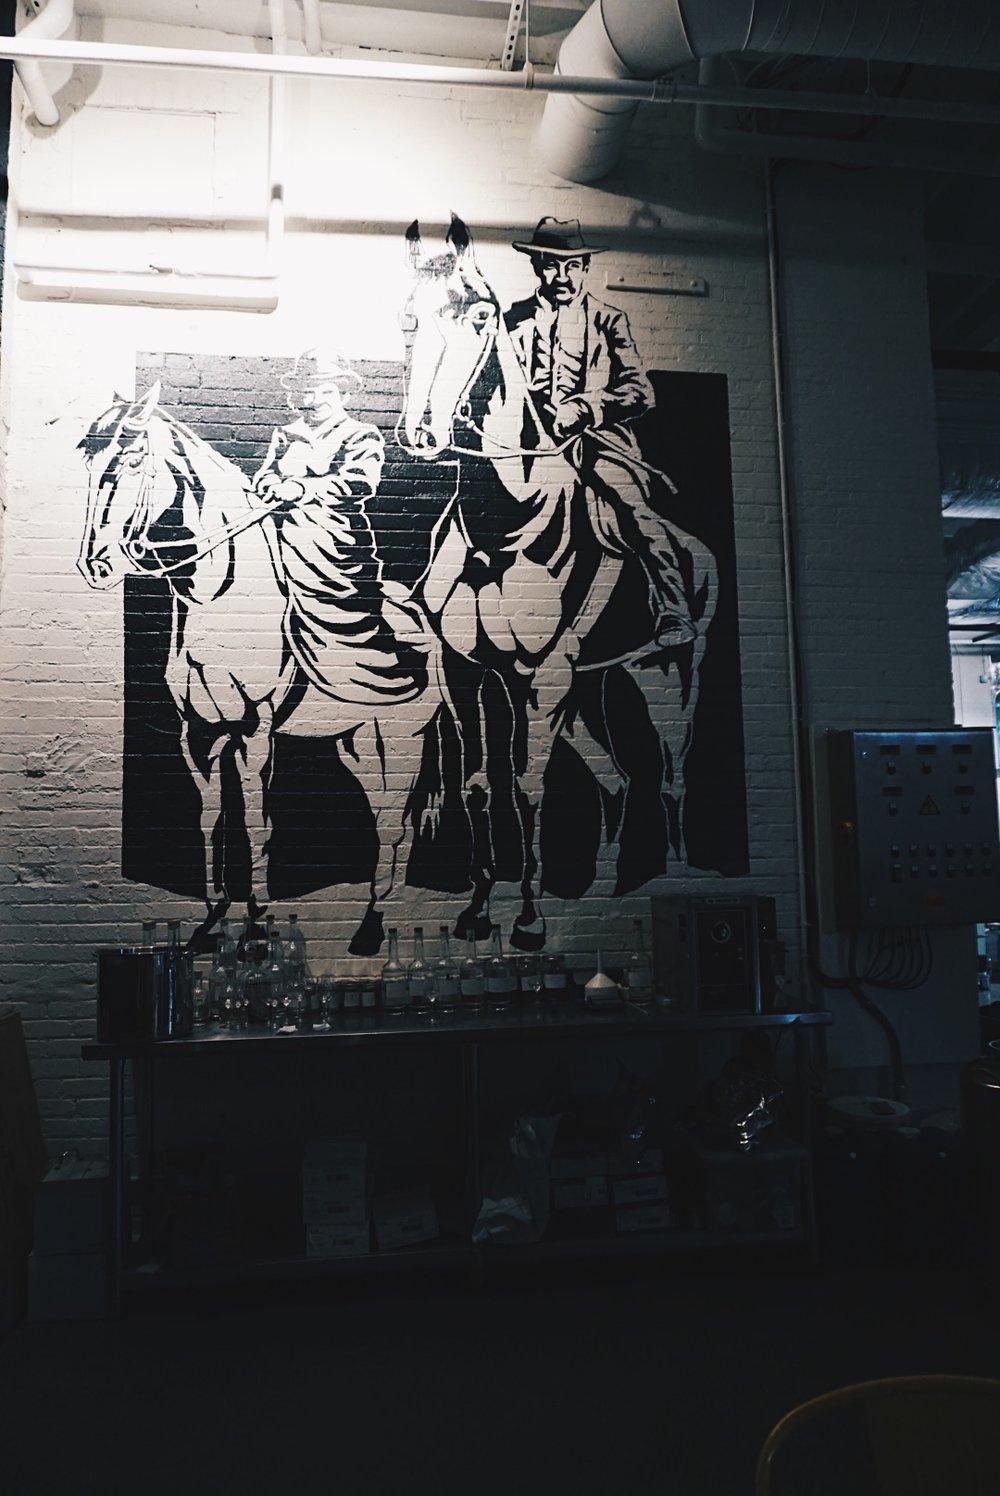 wall art inside bully boy distillers